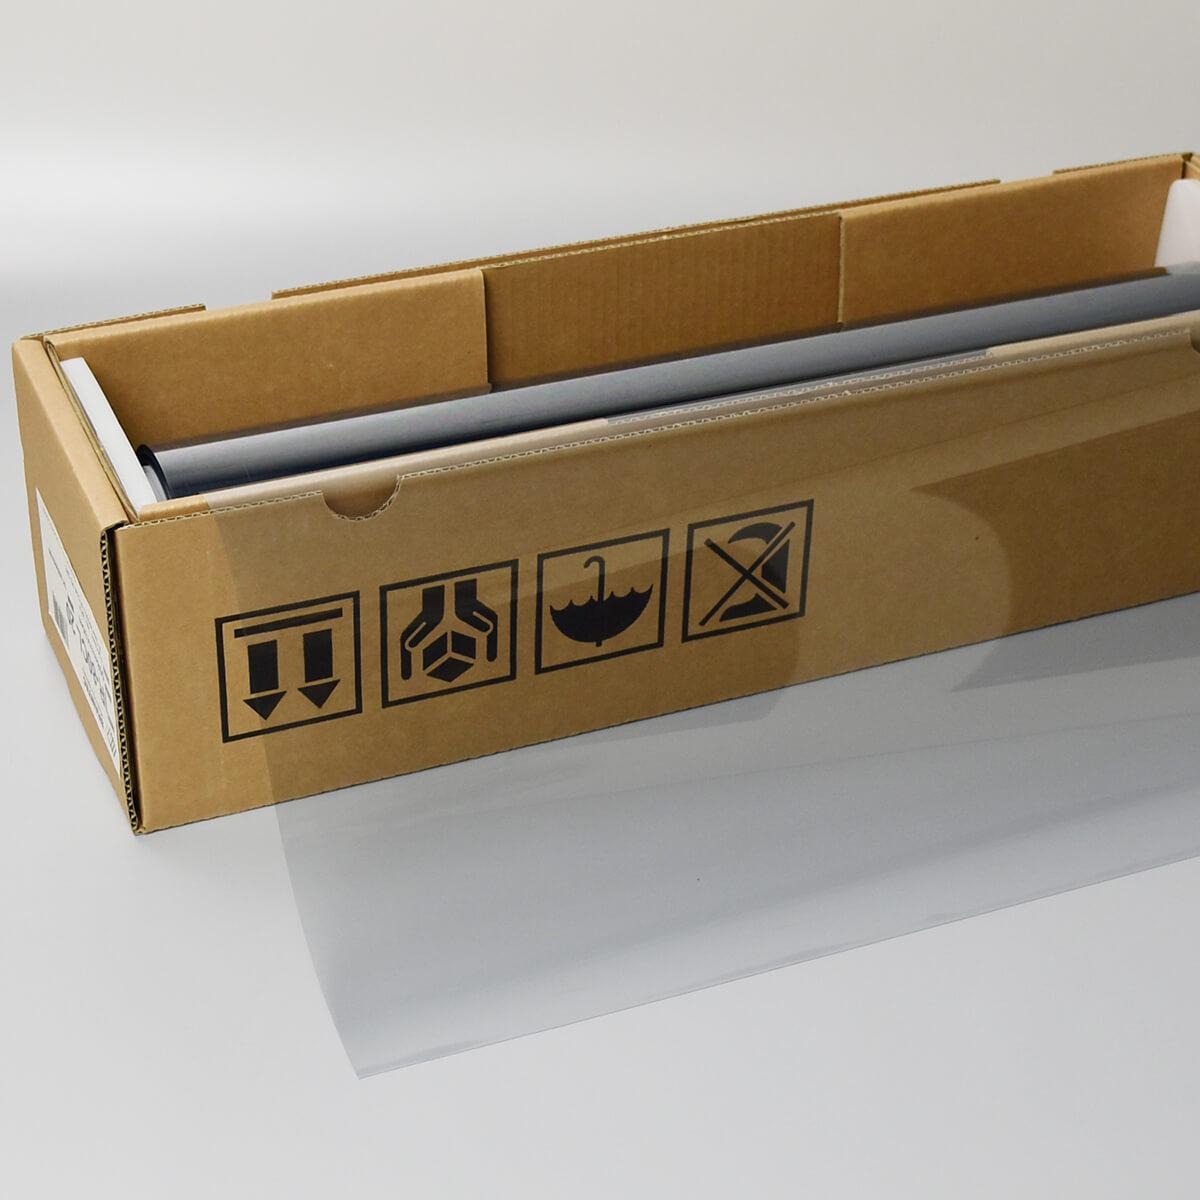 IR透明断熱80(79%) 1.5m幅×30mロール箱売 カーフィルム 飛散防止フィルム 遮熱フィルム 断熱フィルム UVカットフィルム ブレインテック Braintec ※大型商品 同梱不可 沖縄発送不可※ #IR-80CL60 Roll#